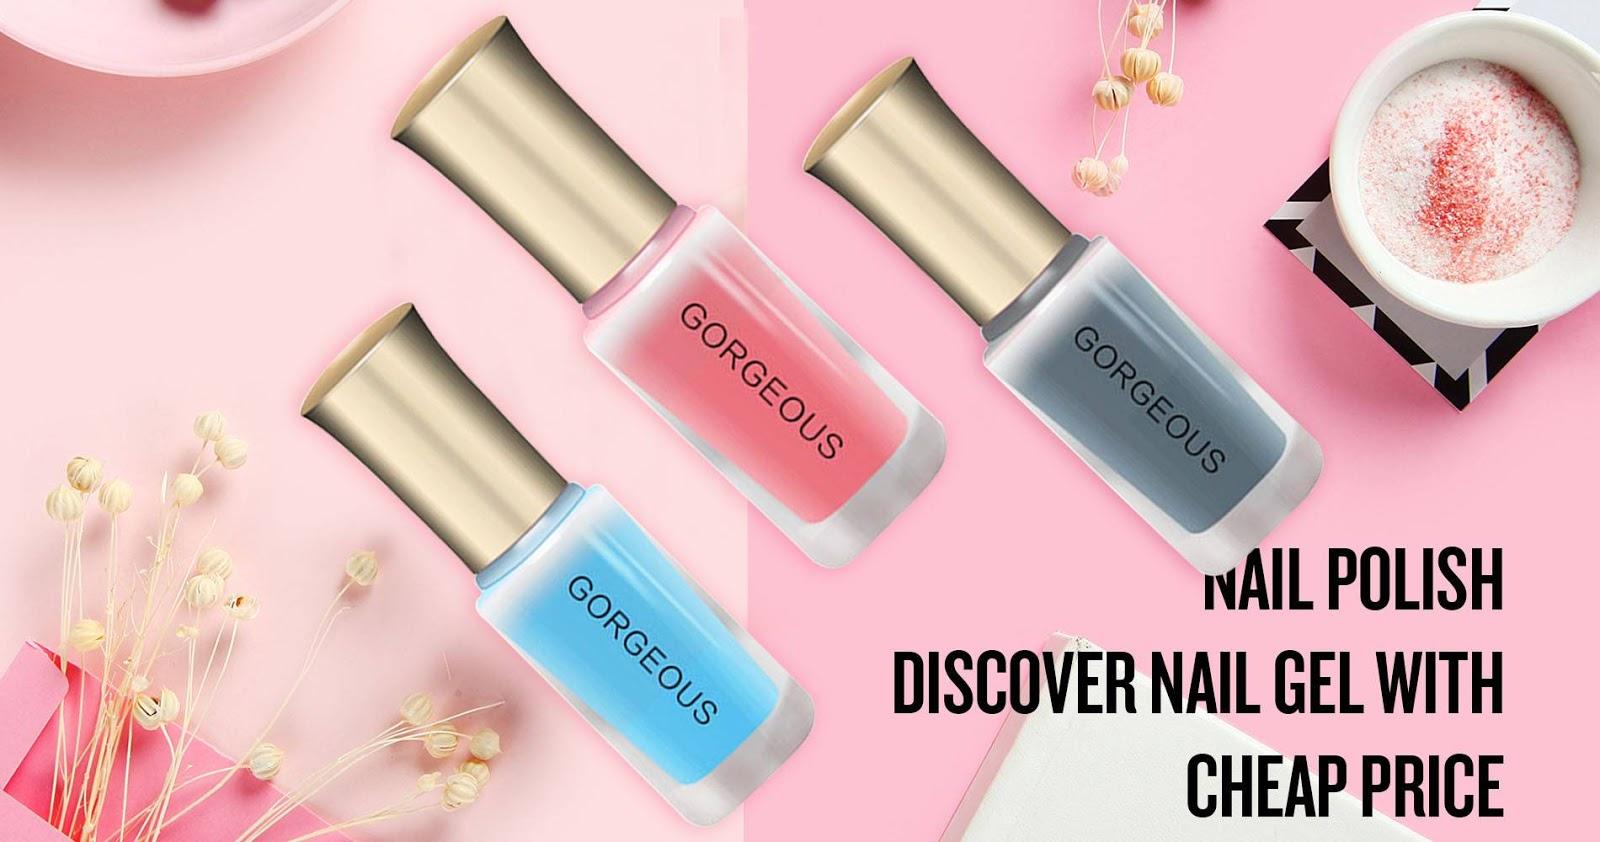 R I L S E E E : StylesNails - for your nails